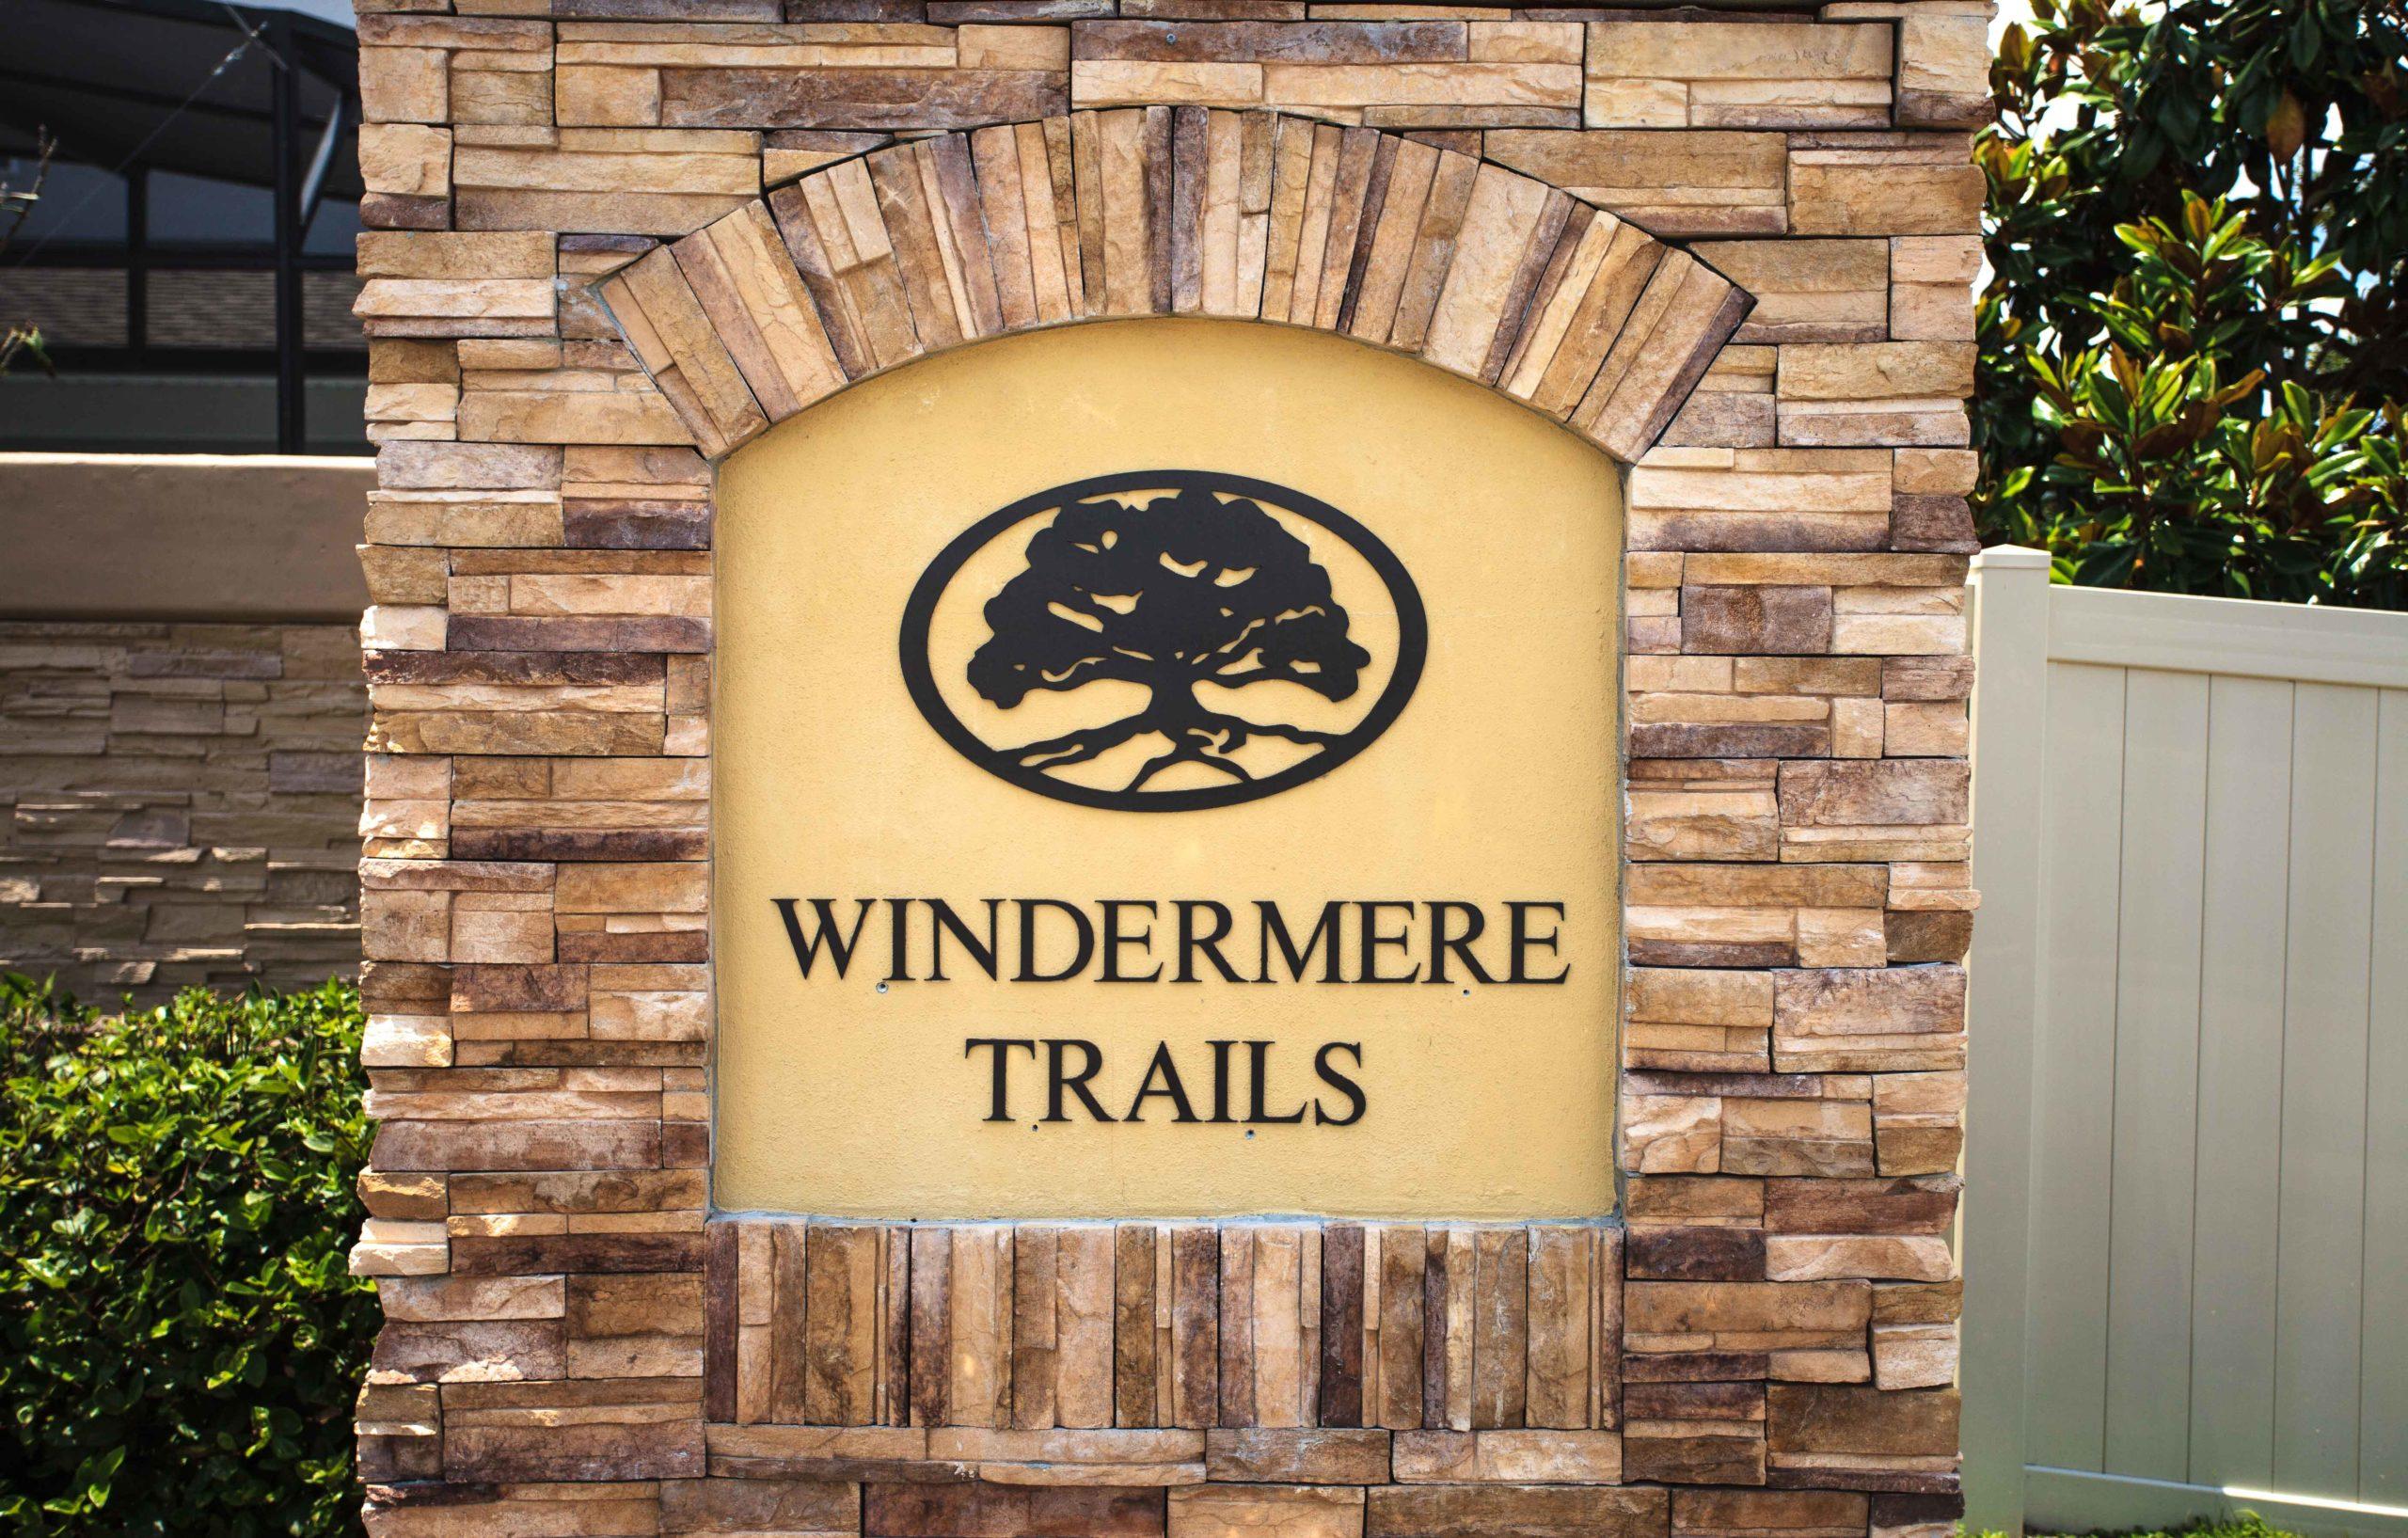 Windermere Trails